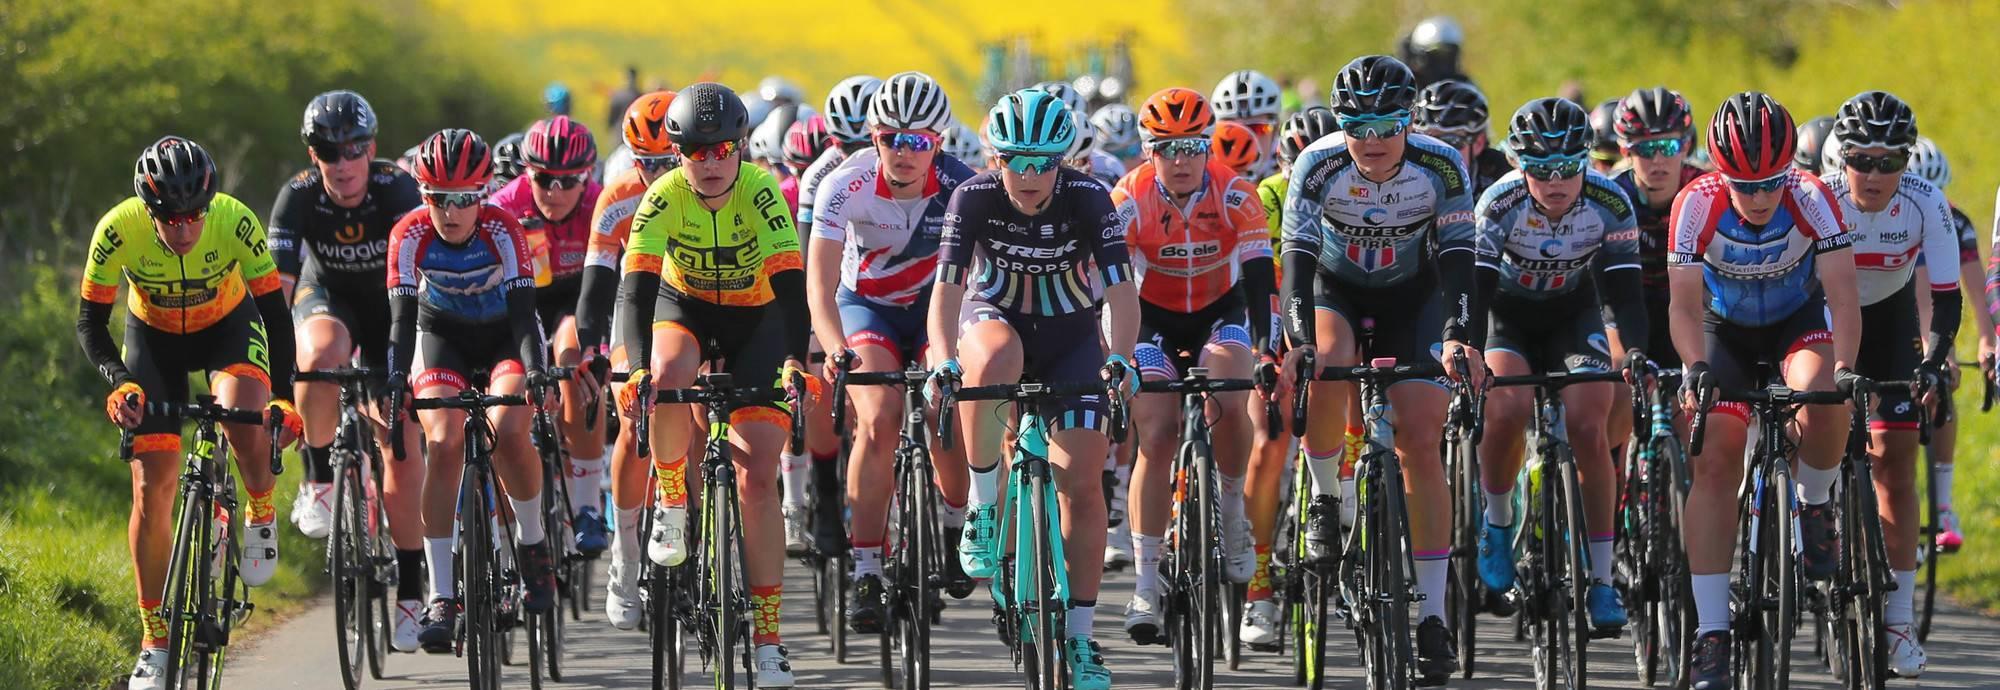 Header: WNT ROTOR PRO CYCLING TEAM